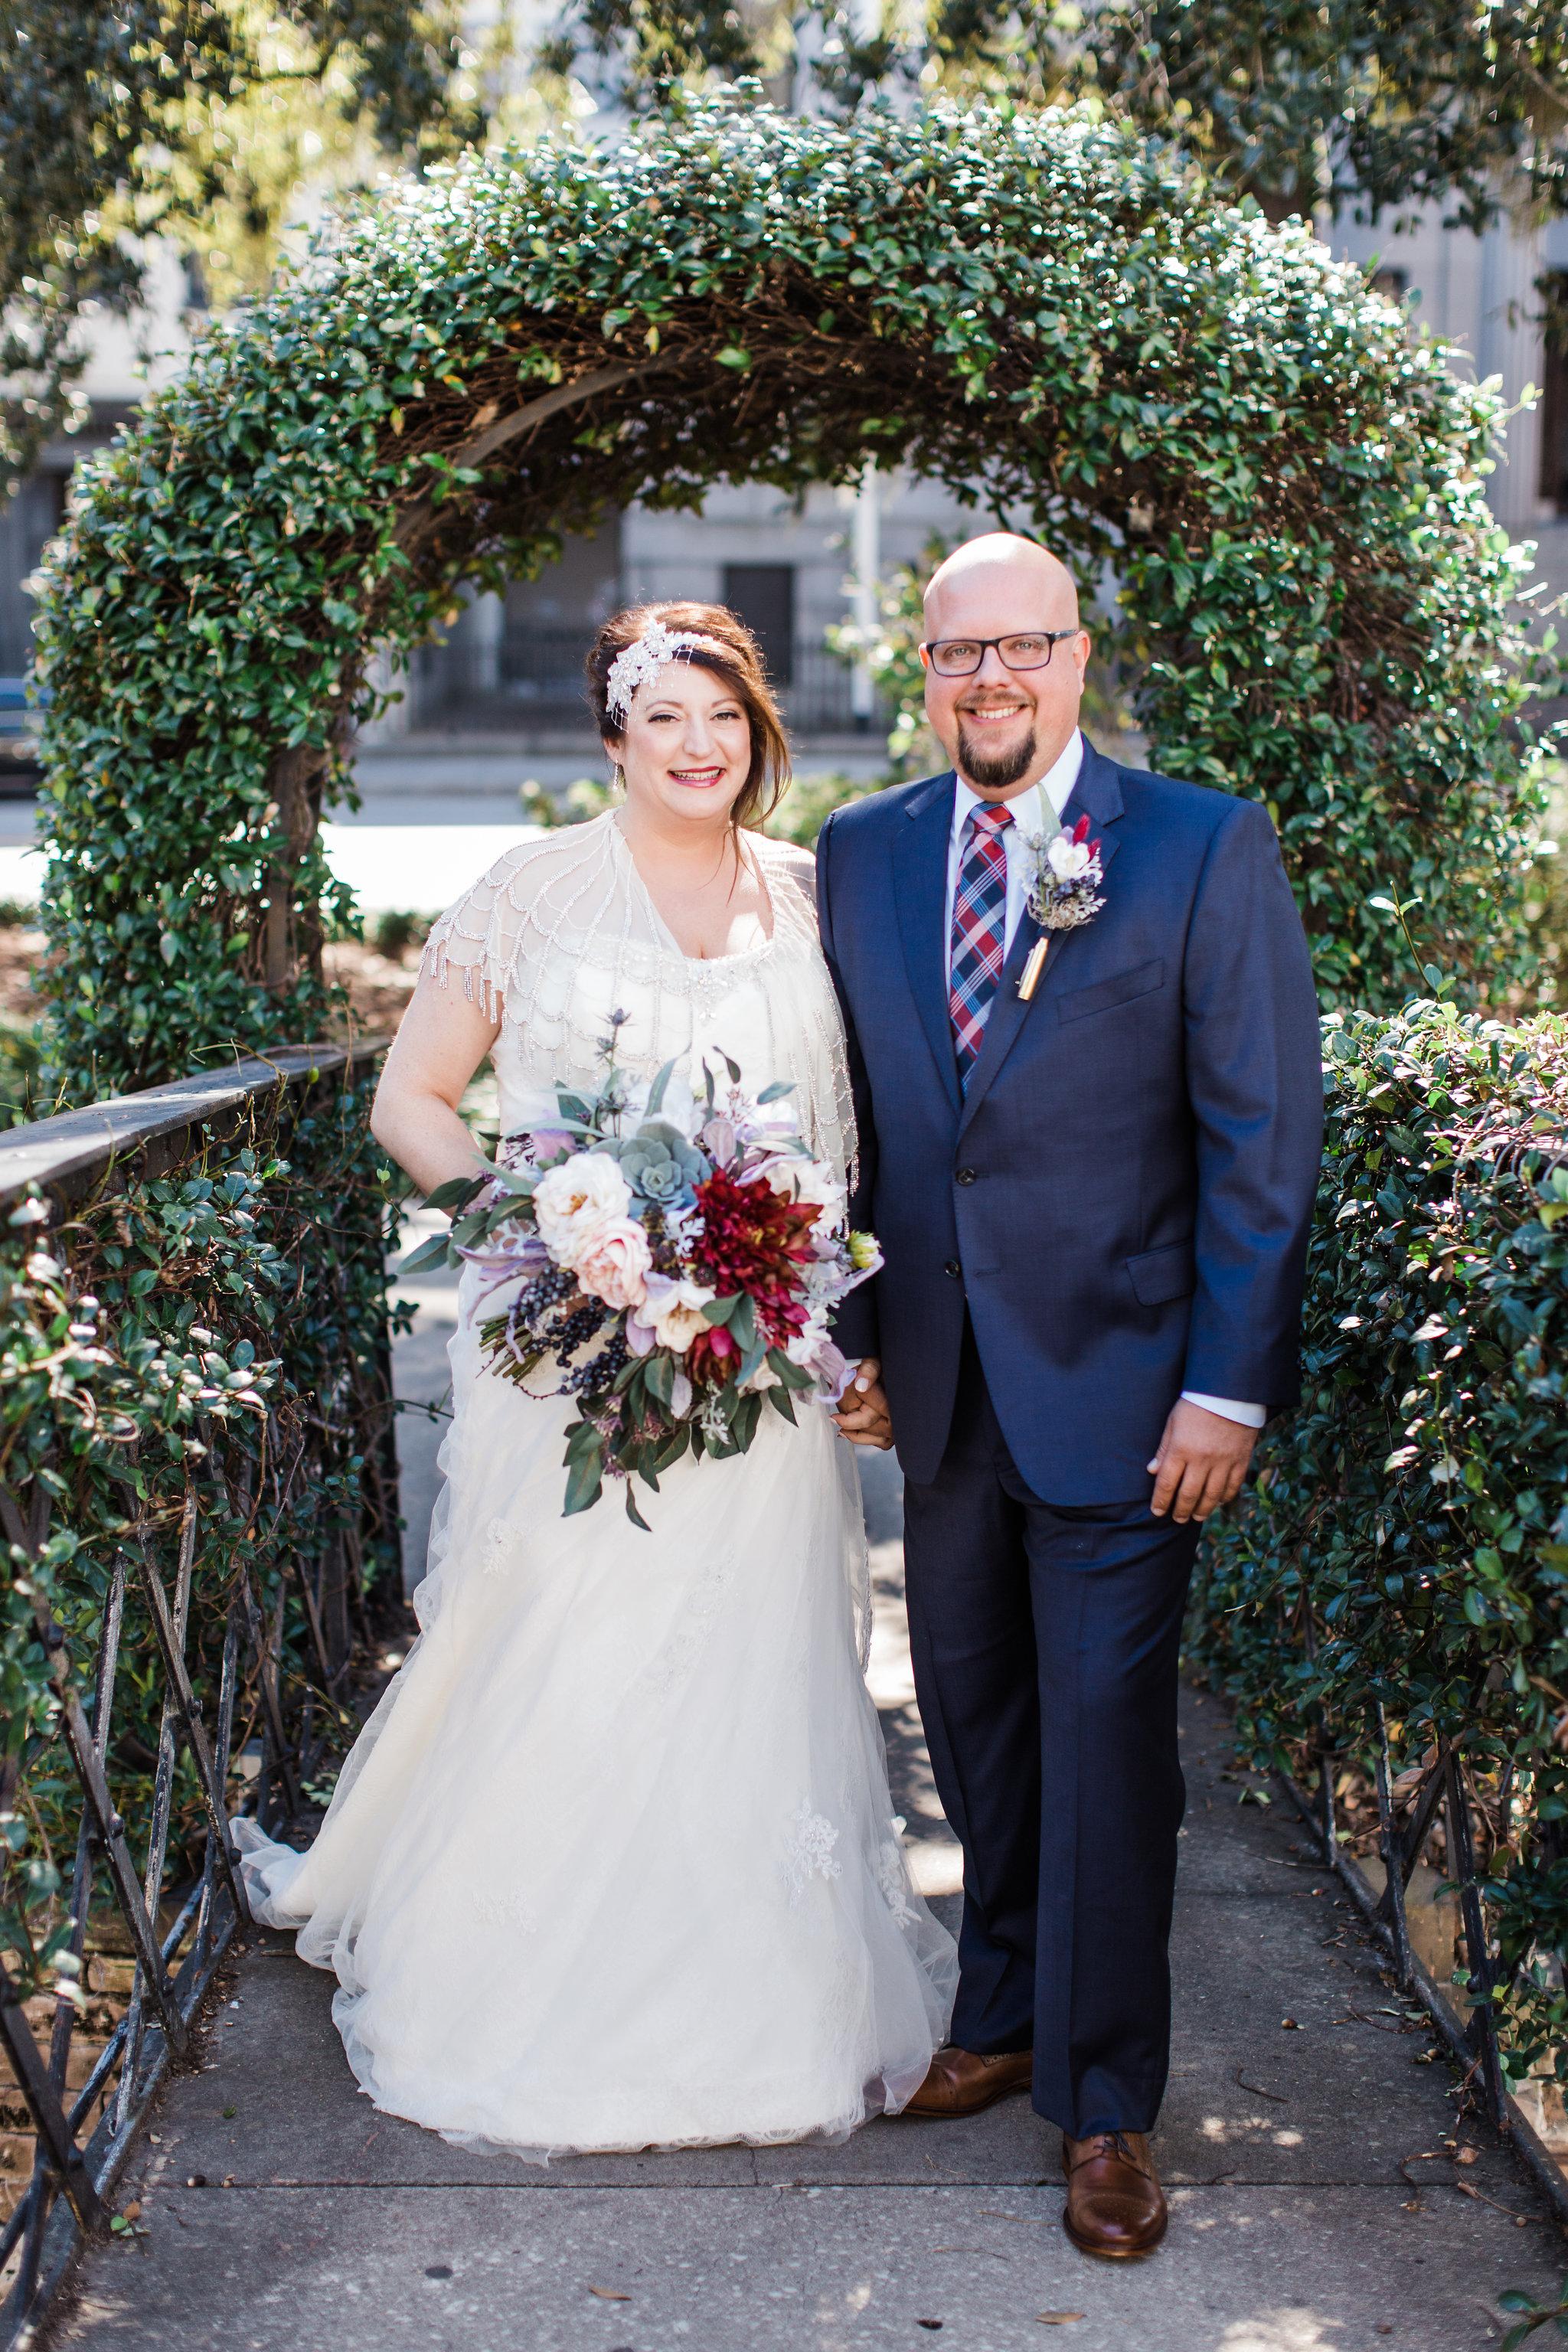 apt-b-photography-kristy-rob-wormsloe-elopment-savannah-wedding-photographer-savannah-elopement-wormsloe-wedding-historic-savannah-10.jpg